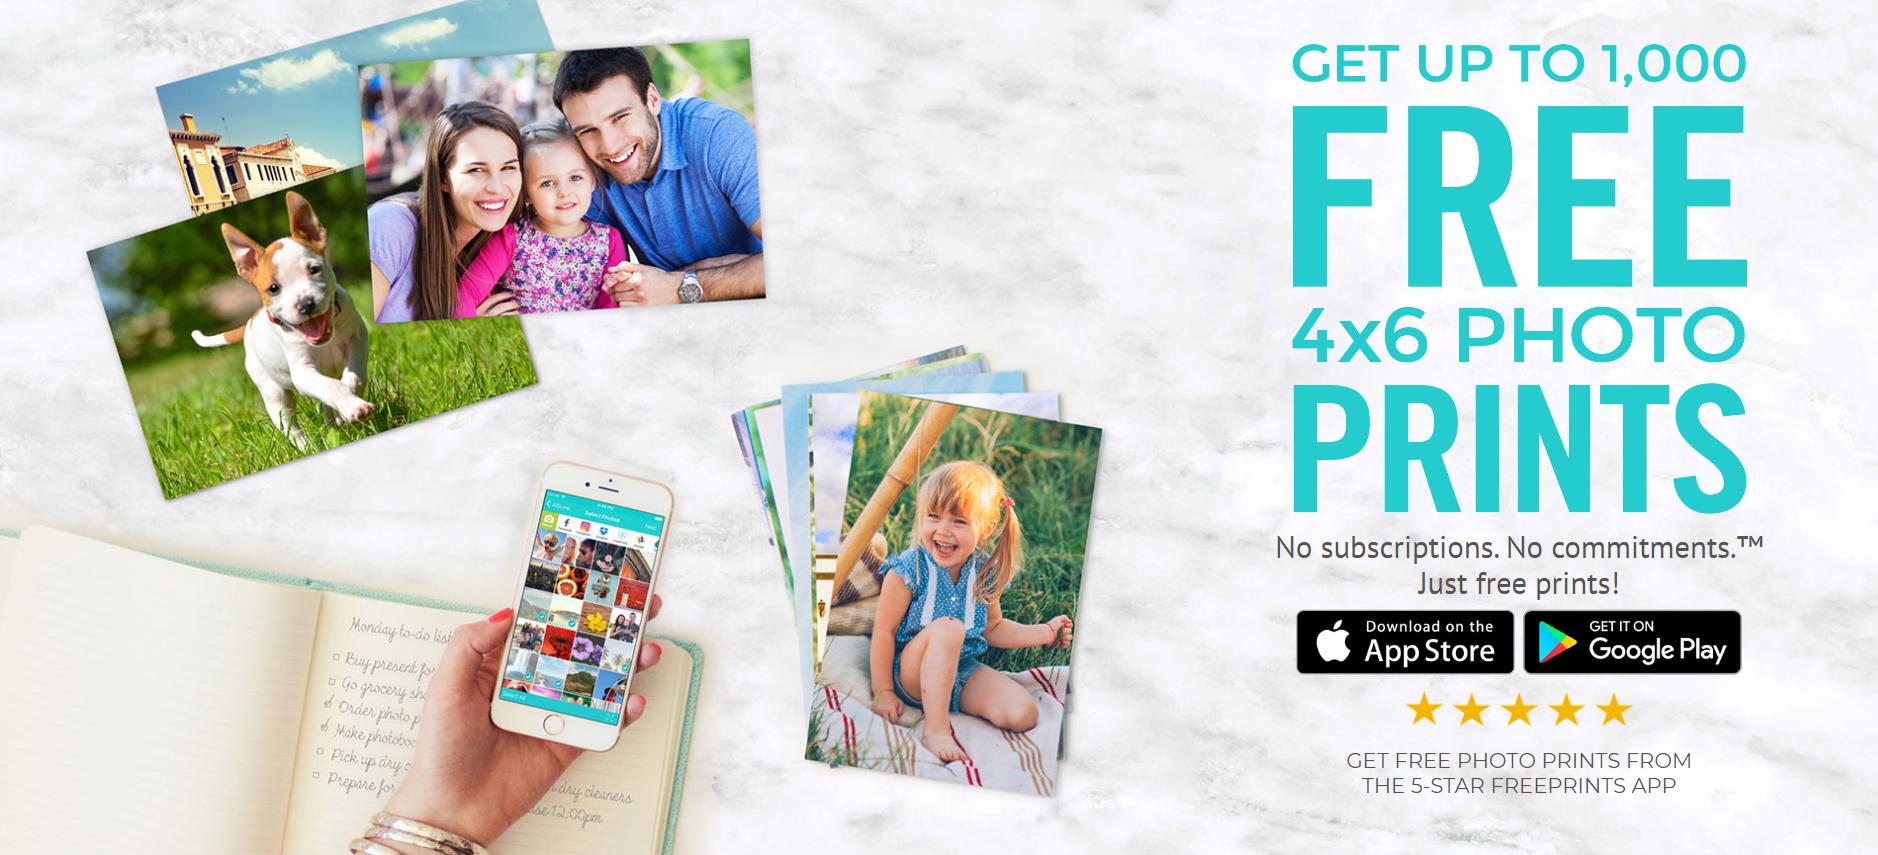 Freeprints website. - print 4x6 photos from iPhone